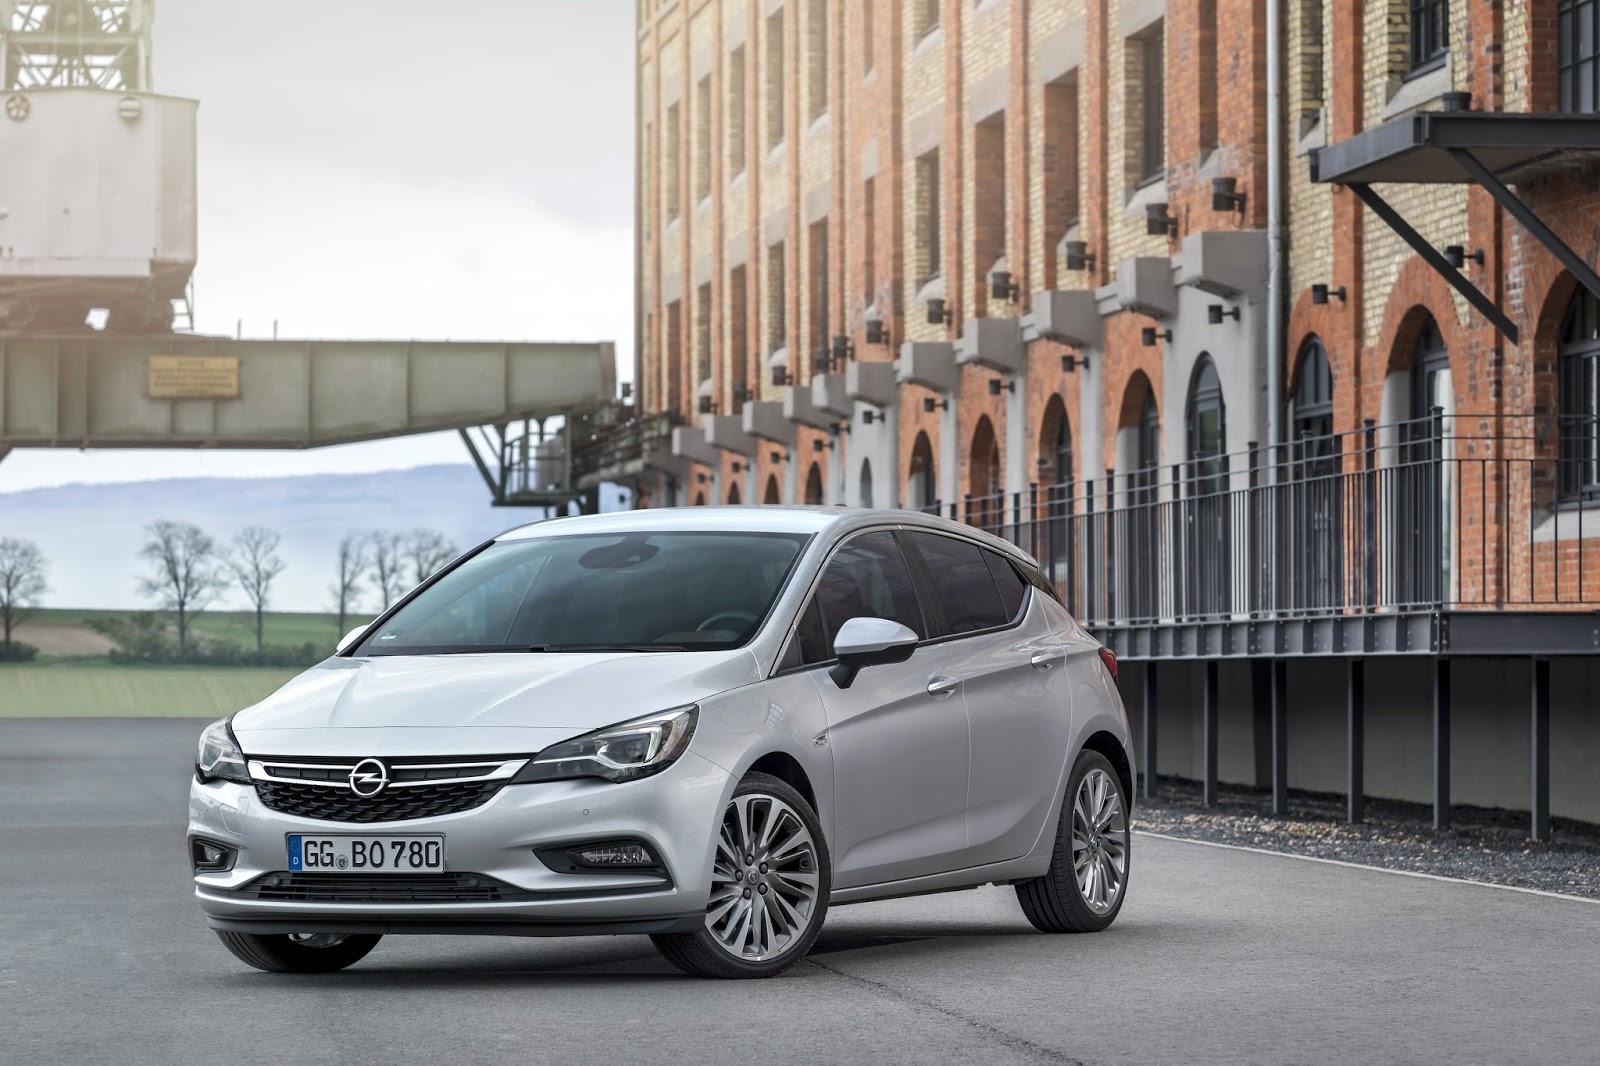 Opel Astra BiTurbo 5 door 301325 Το καυτό Opel Astra BiTurbo diesel συνδυάζει τις επιδόσεις με την οικονομία! Hatchback, Opel, Opel Astra, Opel Astra BiTurbo, Opel Astra BiTurbo Hatchback, twin-turbo